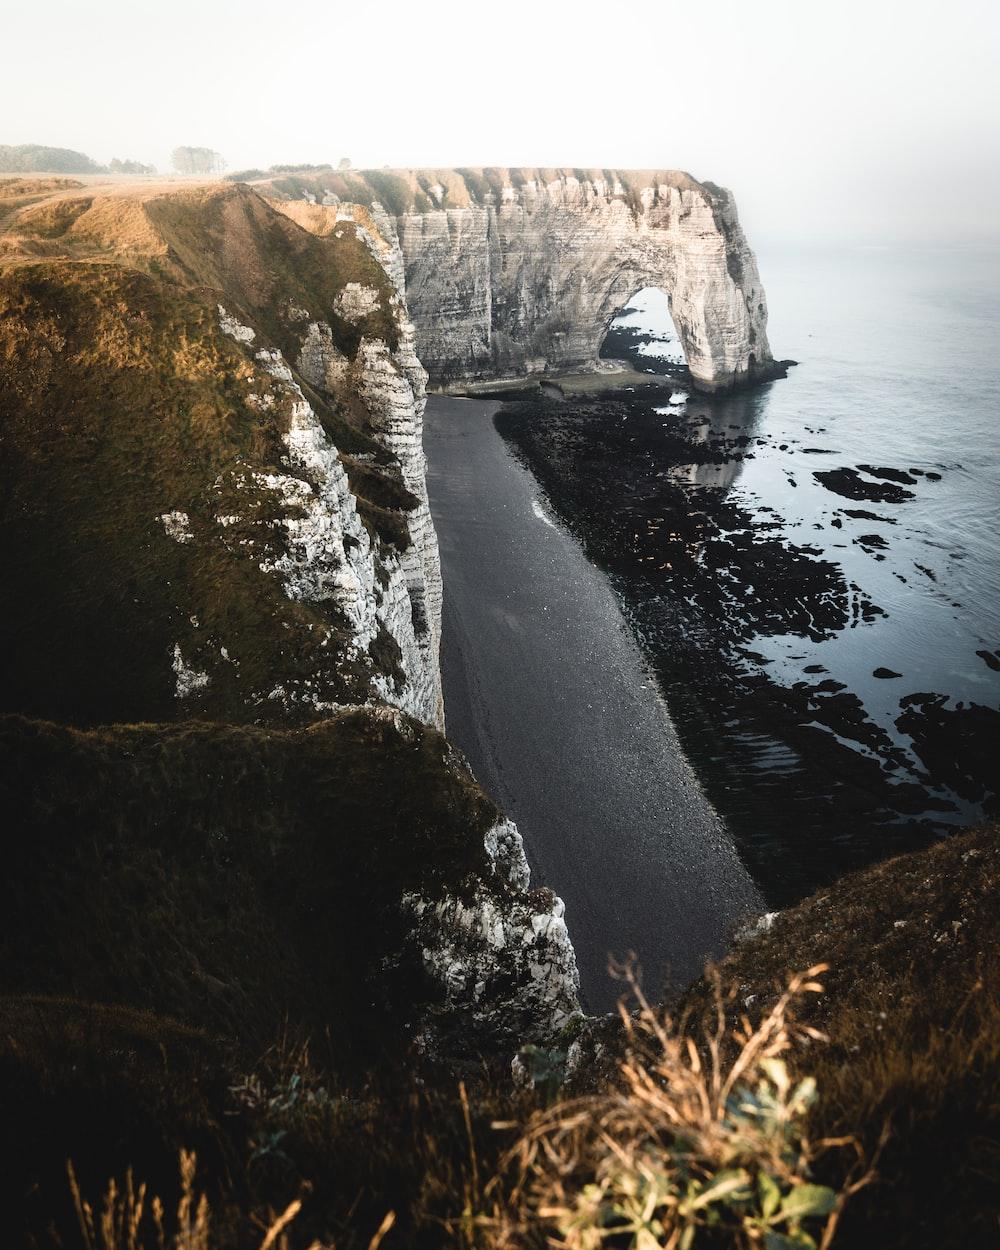 grey cliff beside ocean during daytime